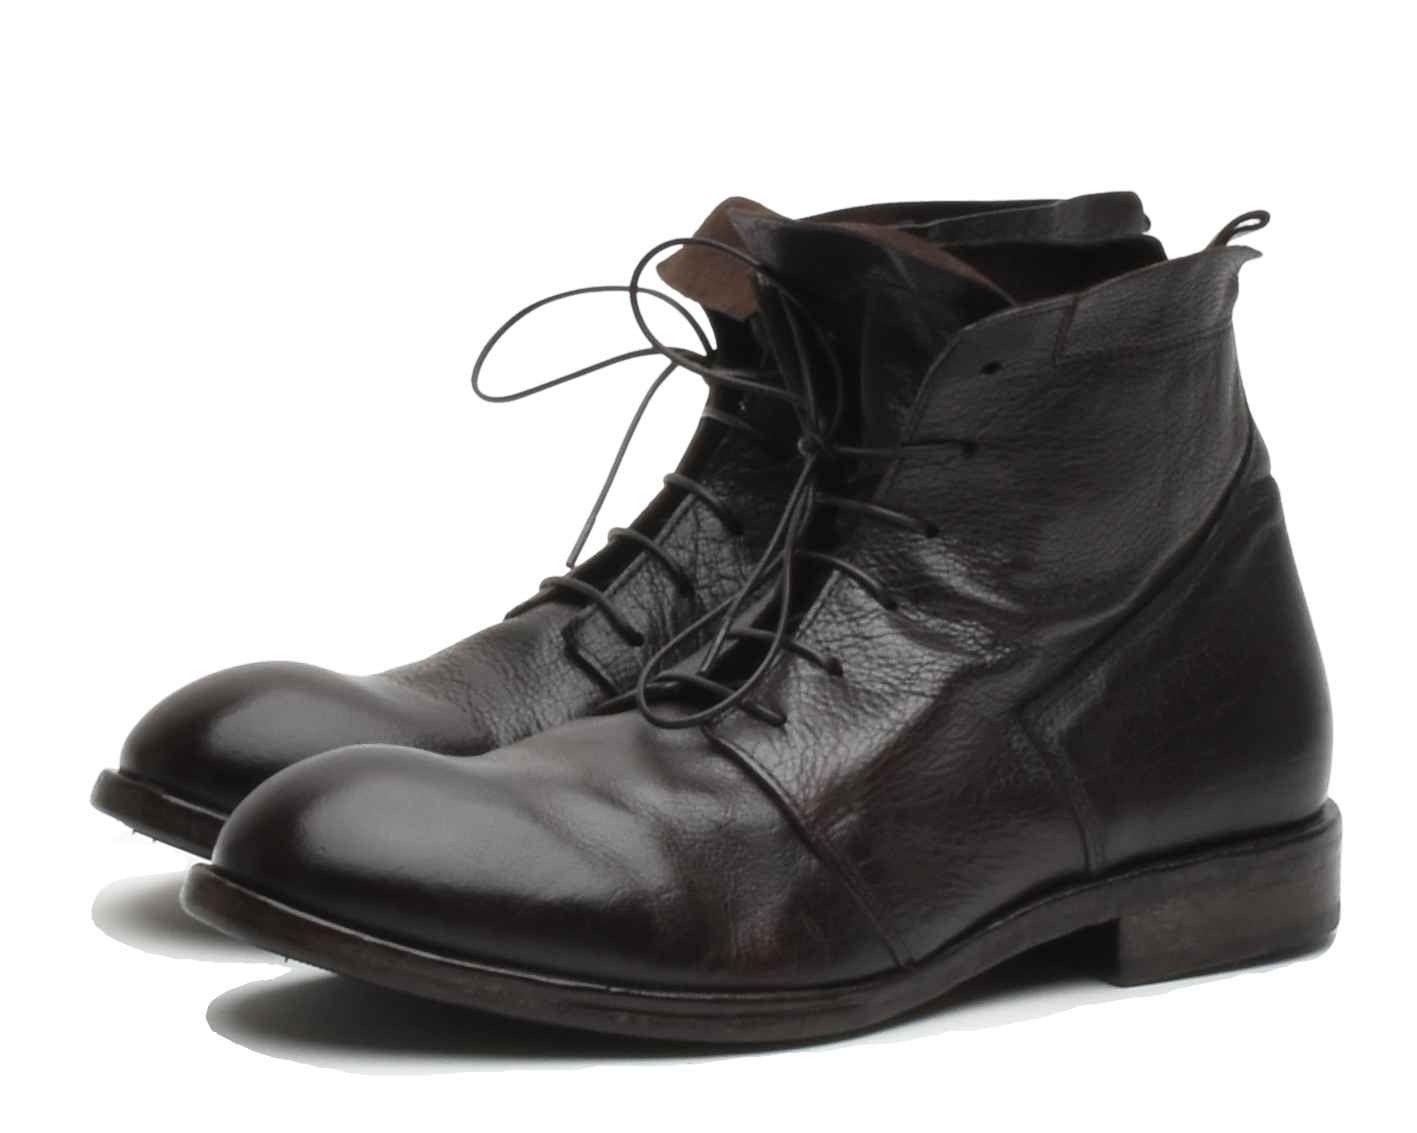 MOMA - Herren Schuhe - Polacco Uomo Bufalo - Dunkelbraun